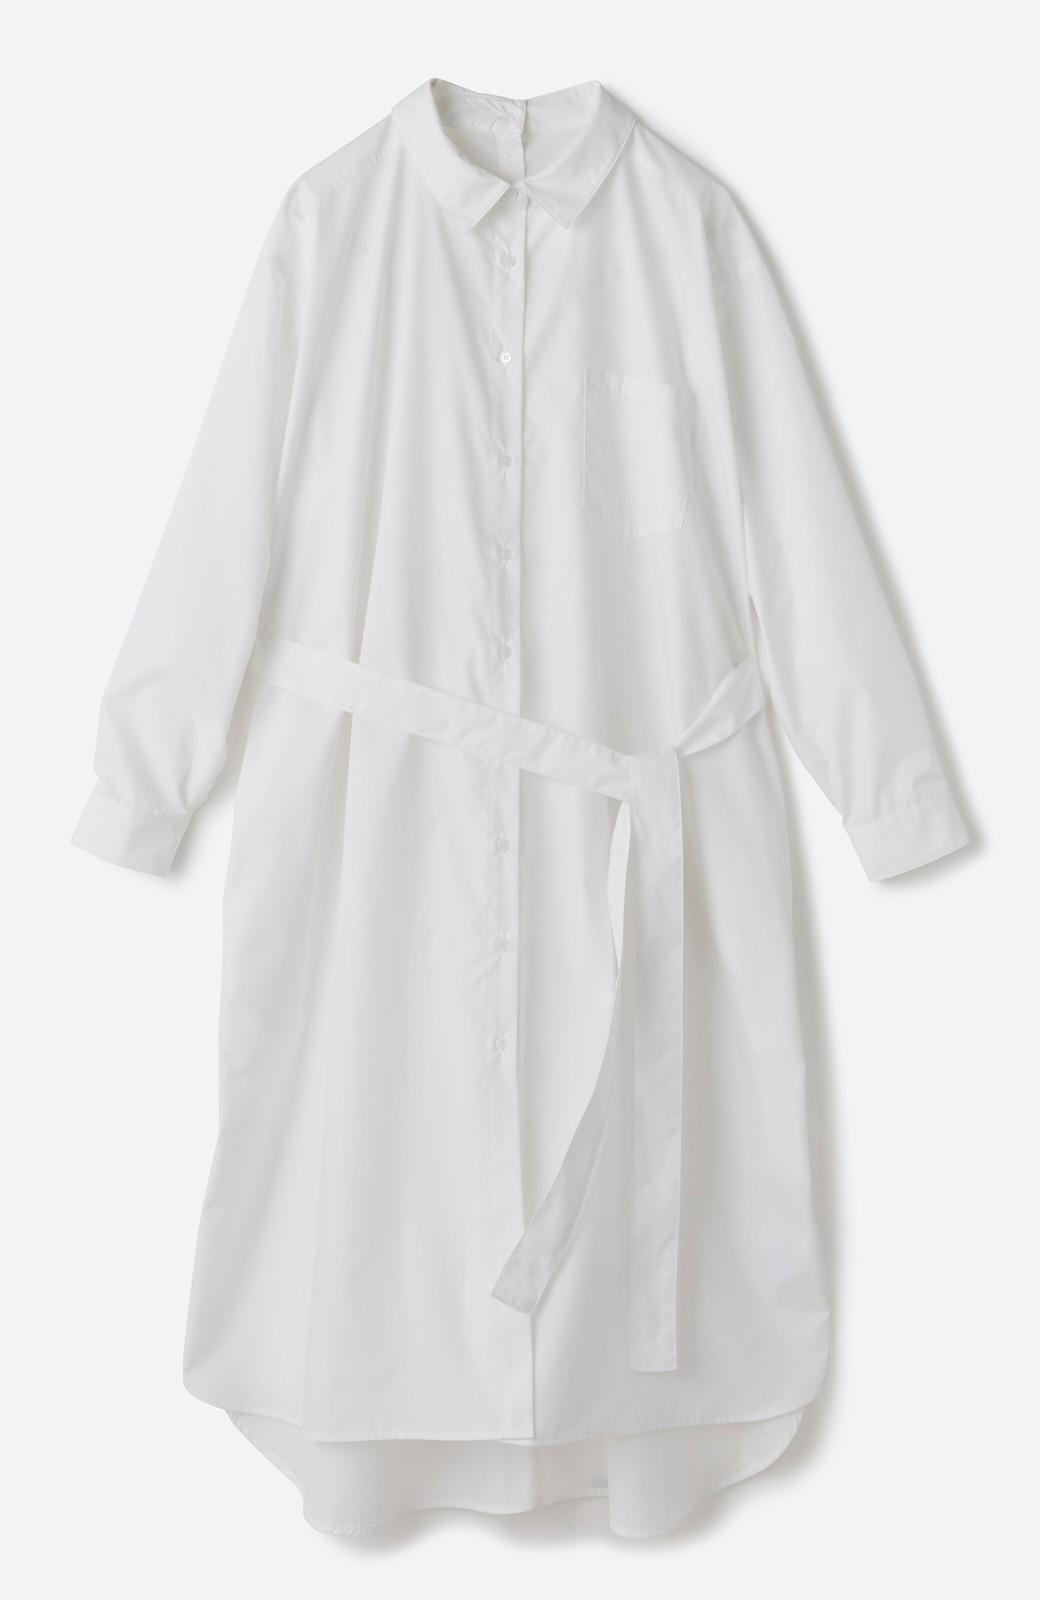 haco! 気持ちが凛と改まる リボン付きオーバーサイズシャツワンピース <ホワイト>の商品写真3